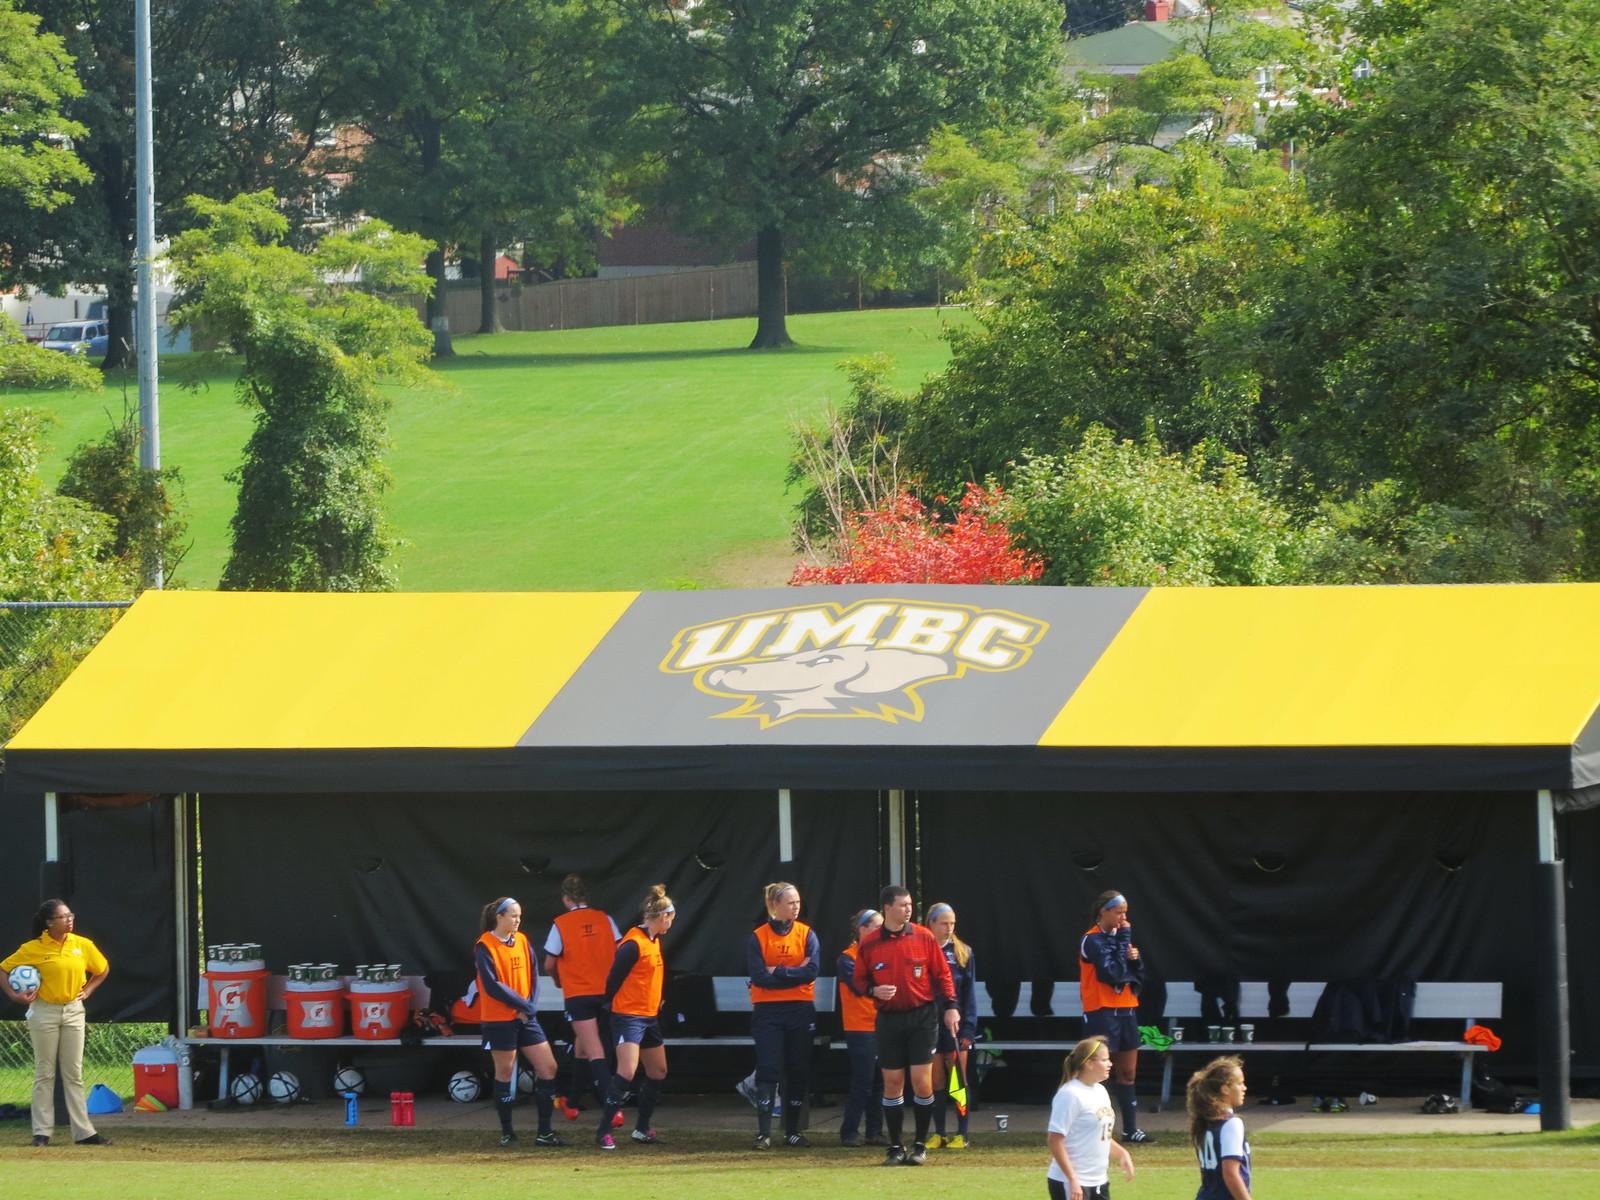 Soccer Awning Baltimore School